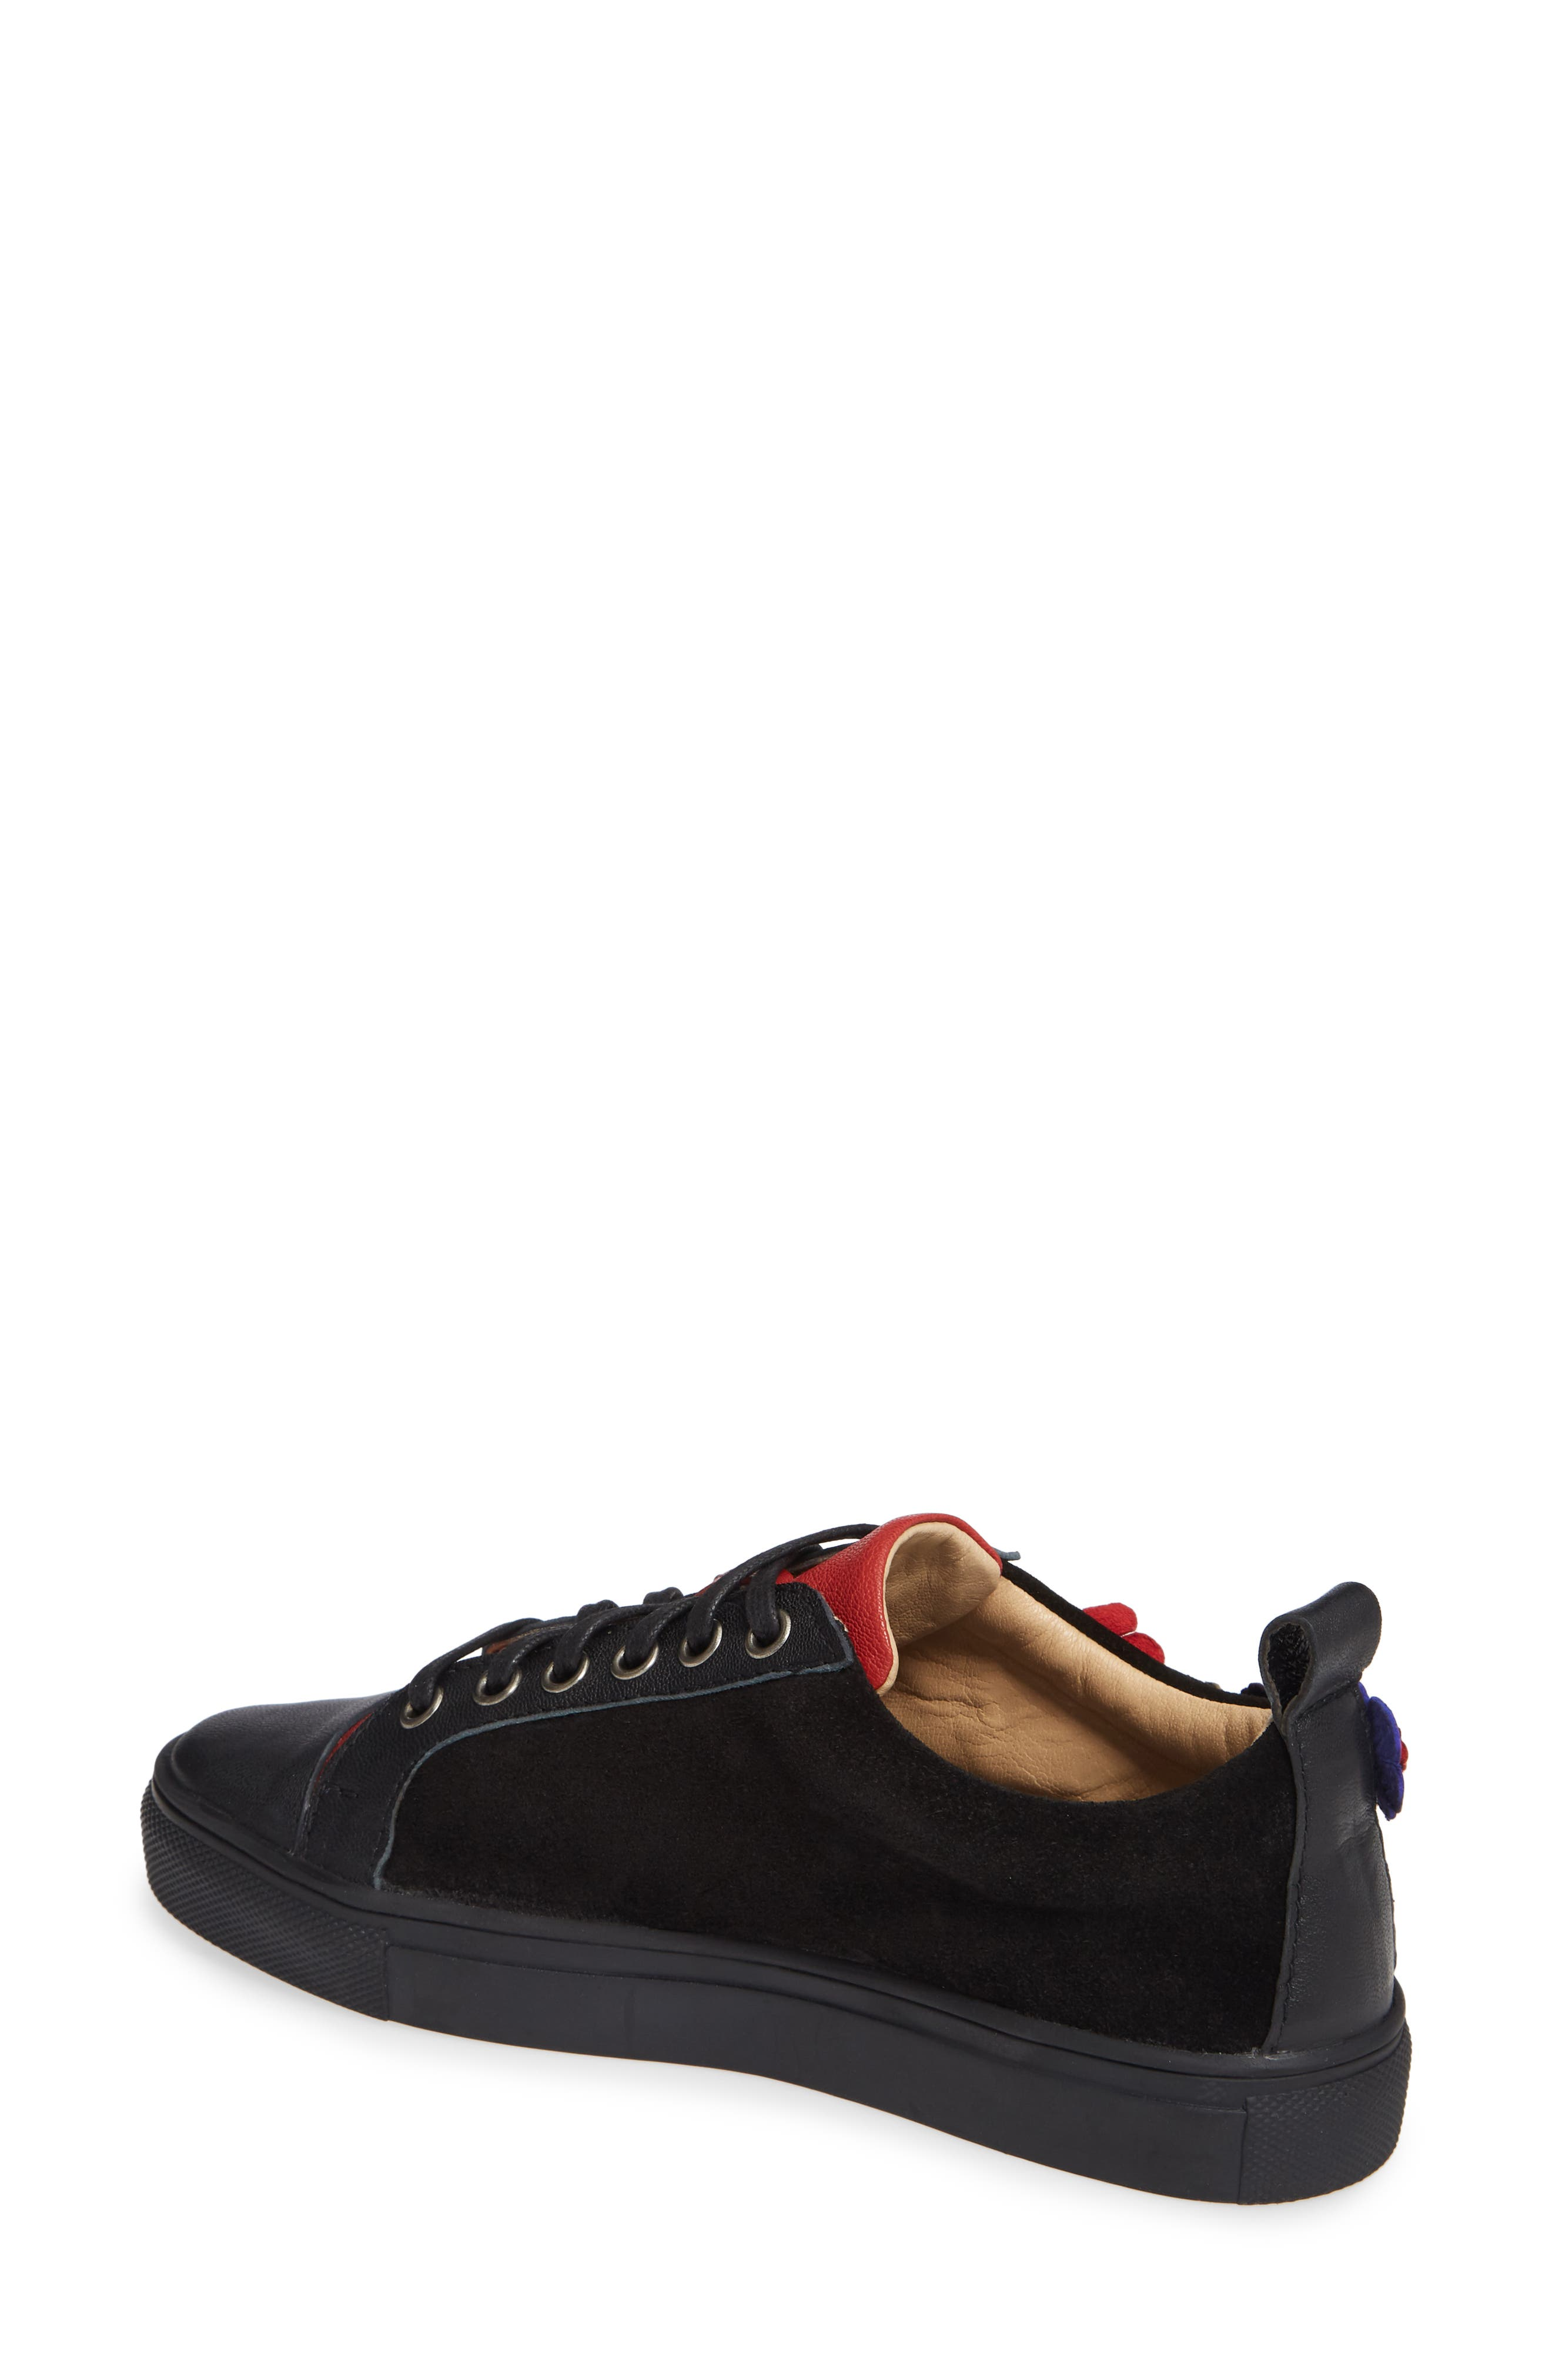 SHERIDAN MIA, Satyr Sneaker, Alternate thumbnail 2, color, BLACK LEATHER